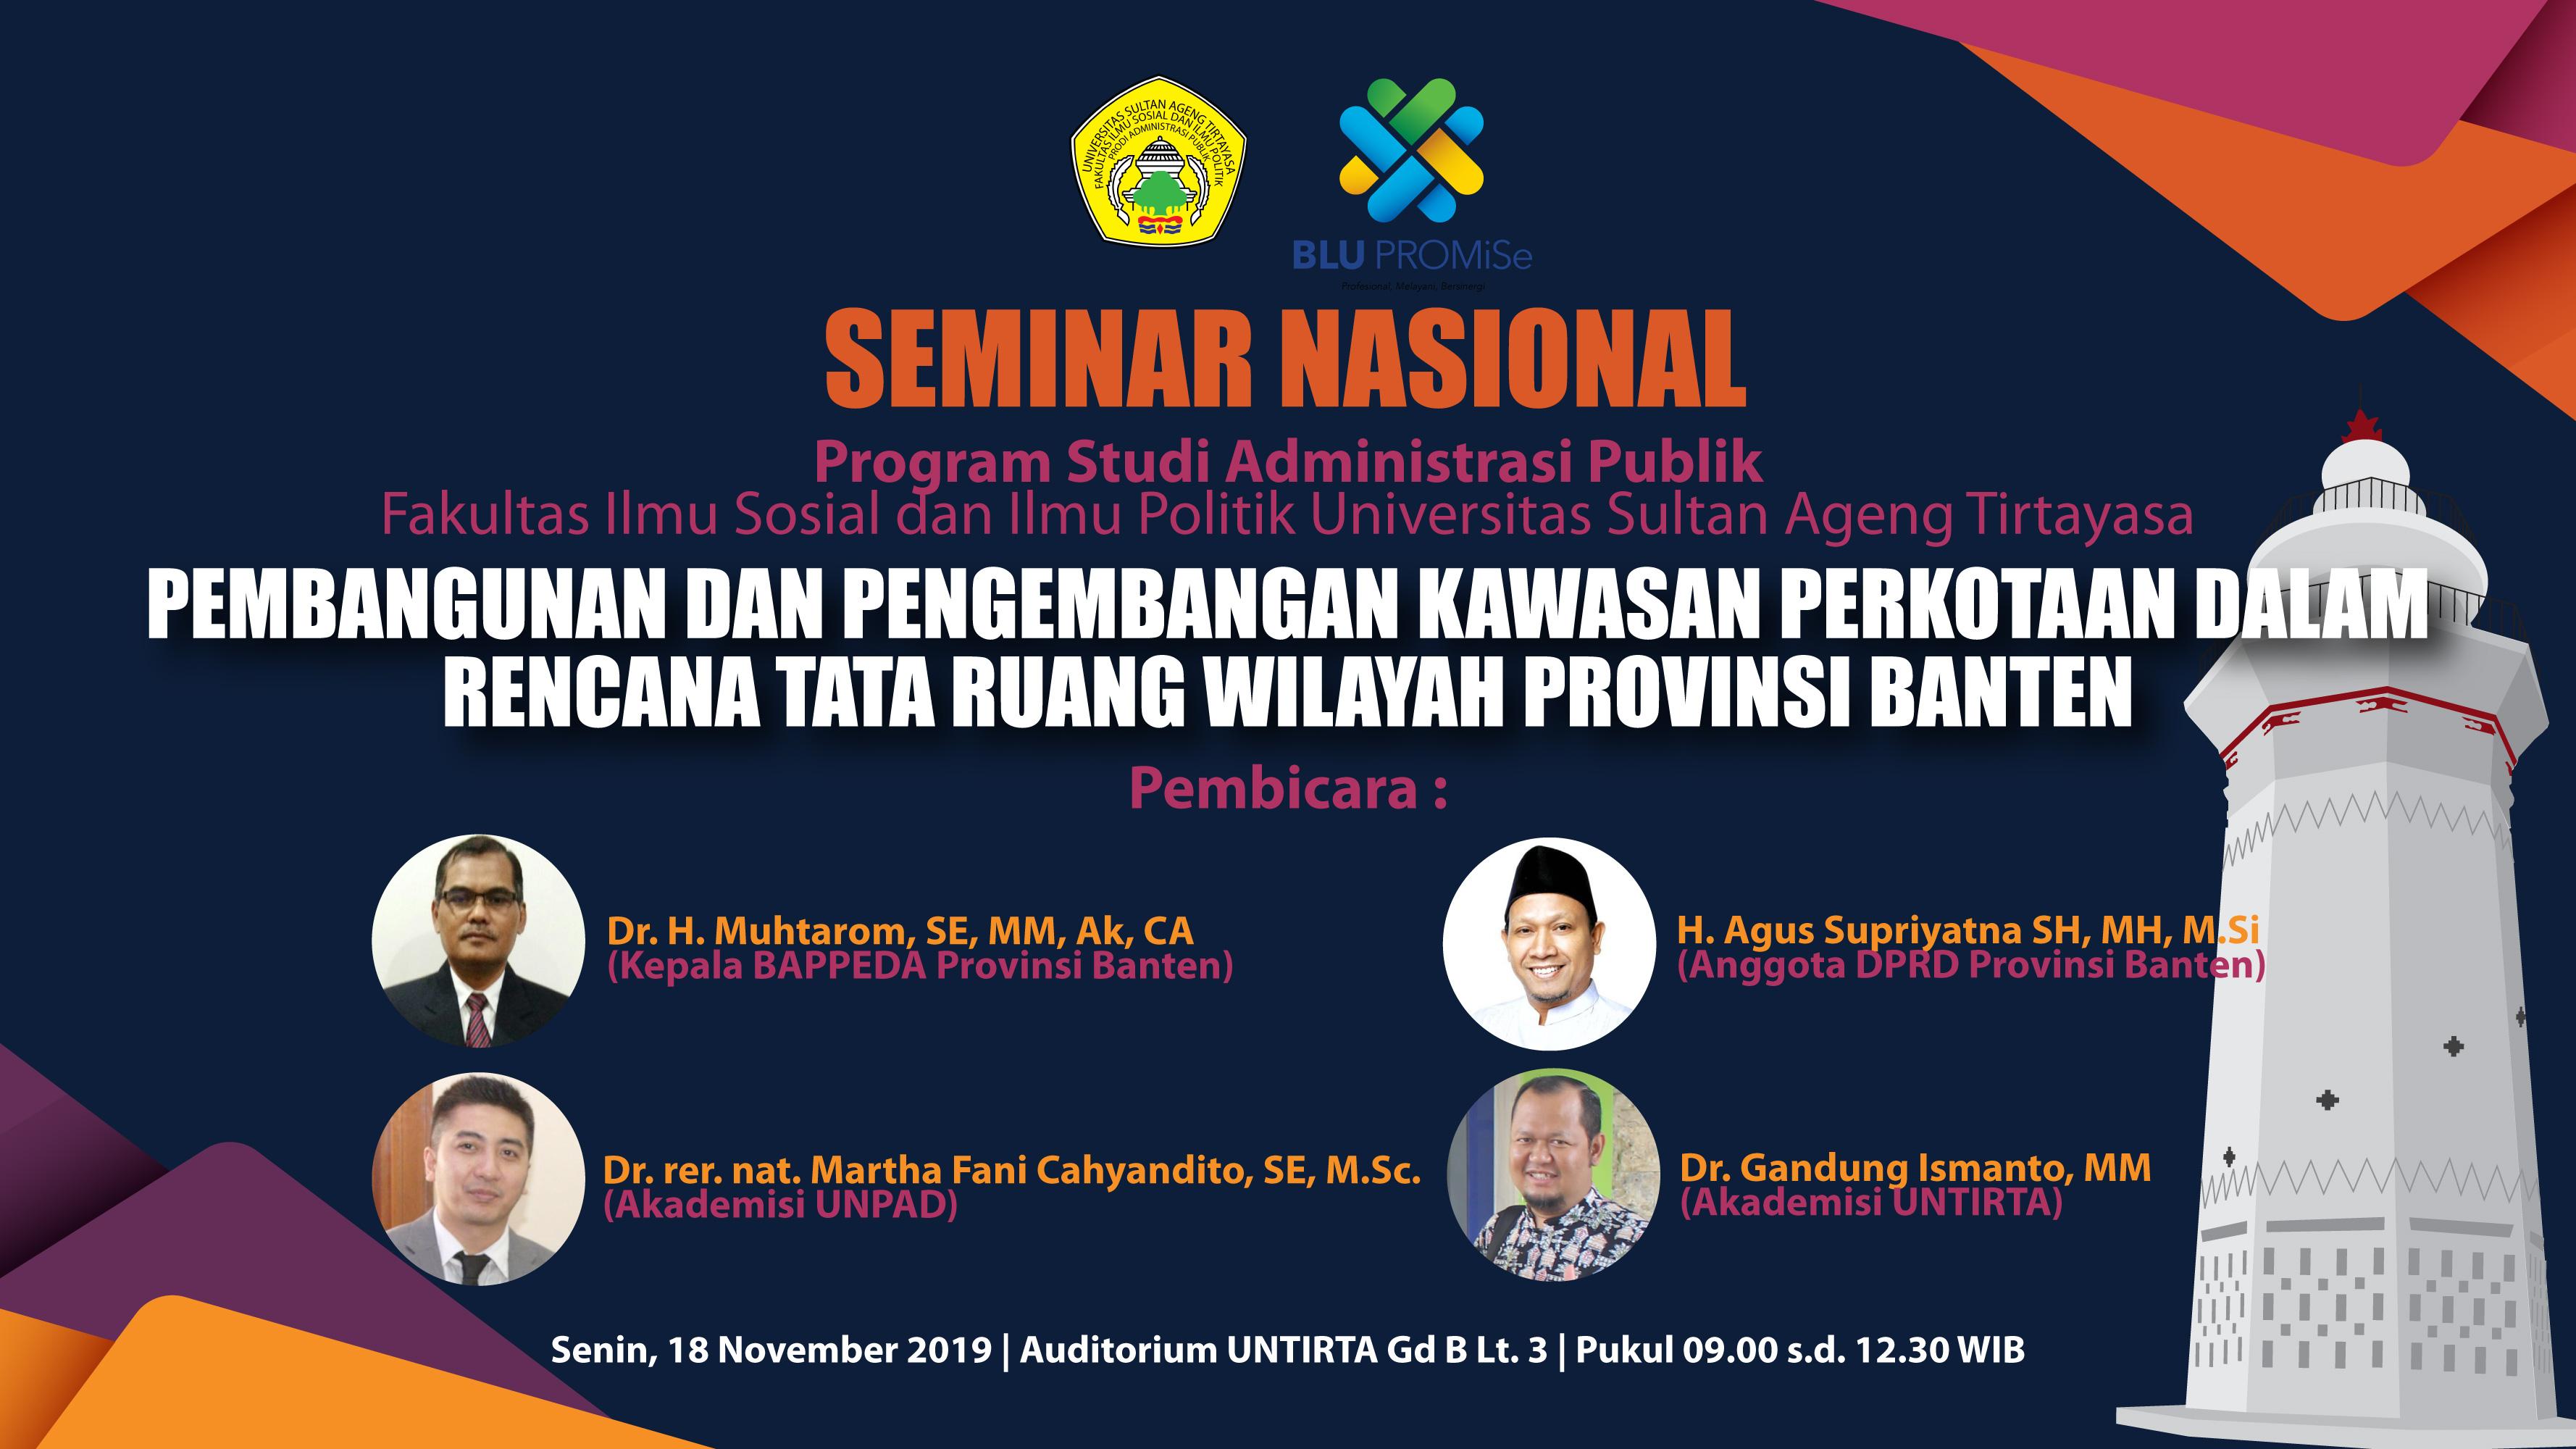 Seminar Nasional Prodi Administrasi Publik, 18 November 2019